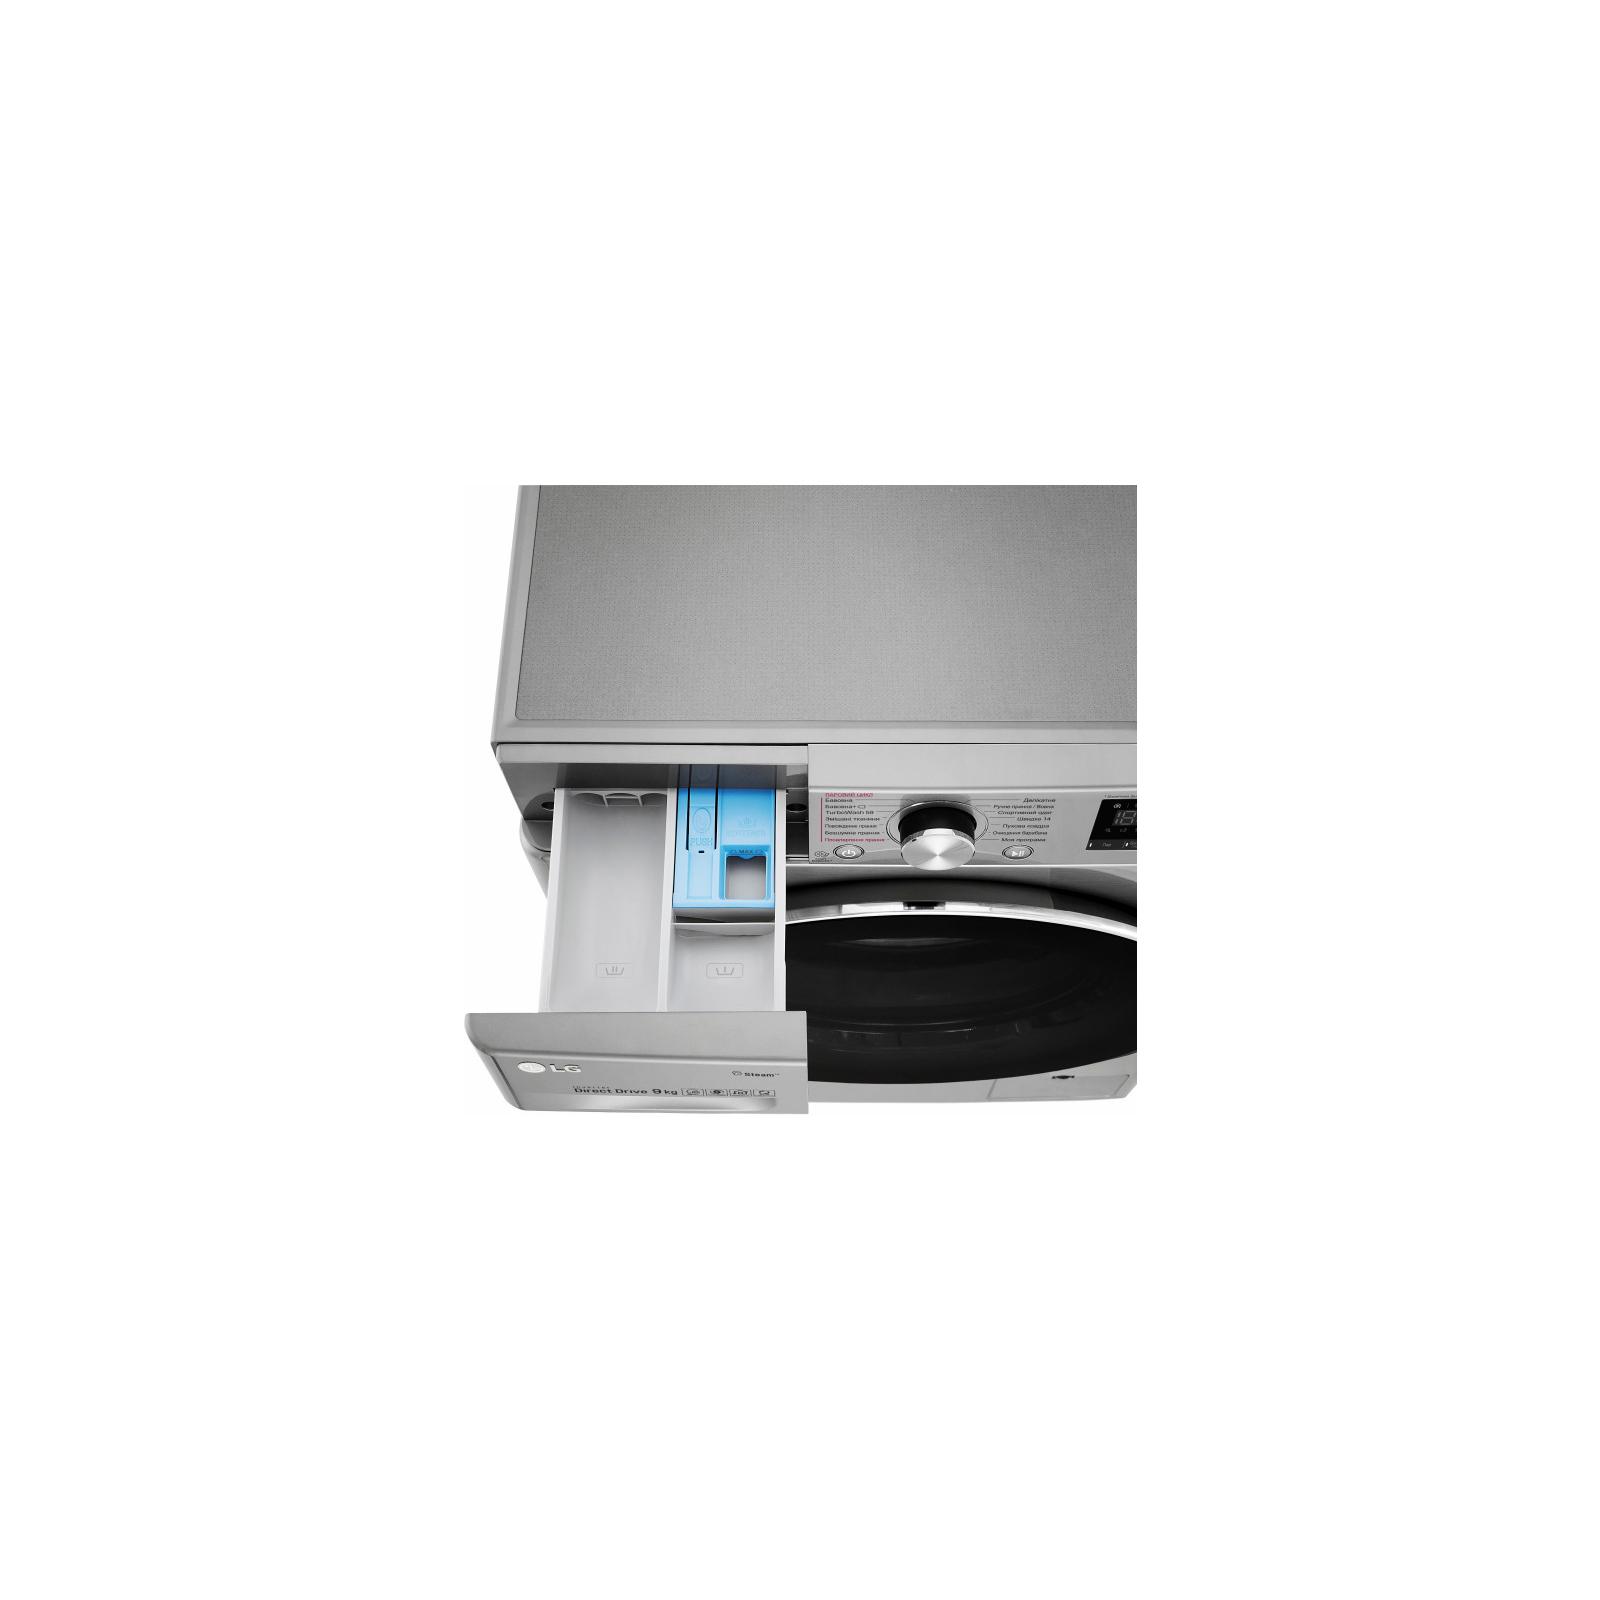 Стиральная машина LG F4V7VW9T изображение 11